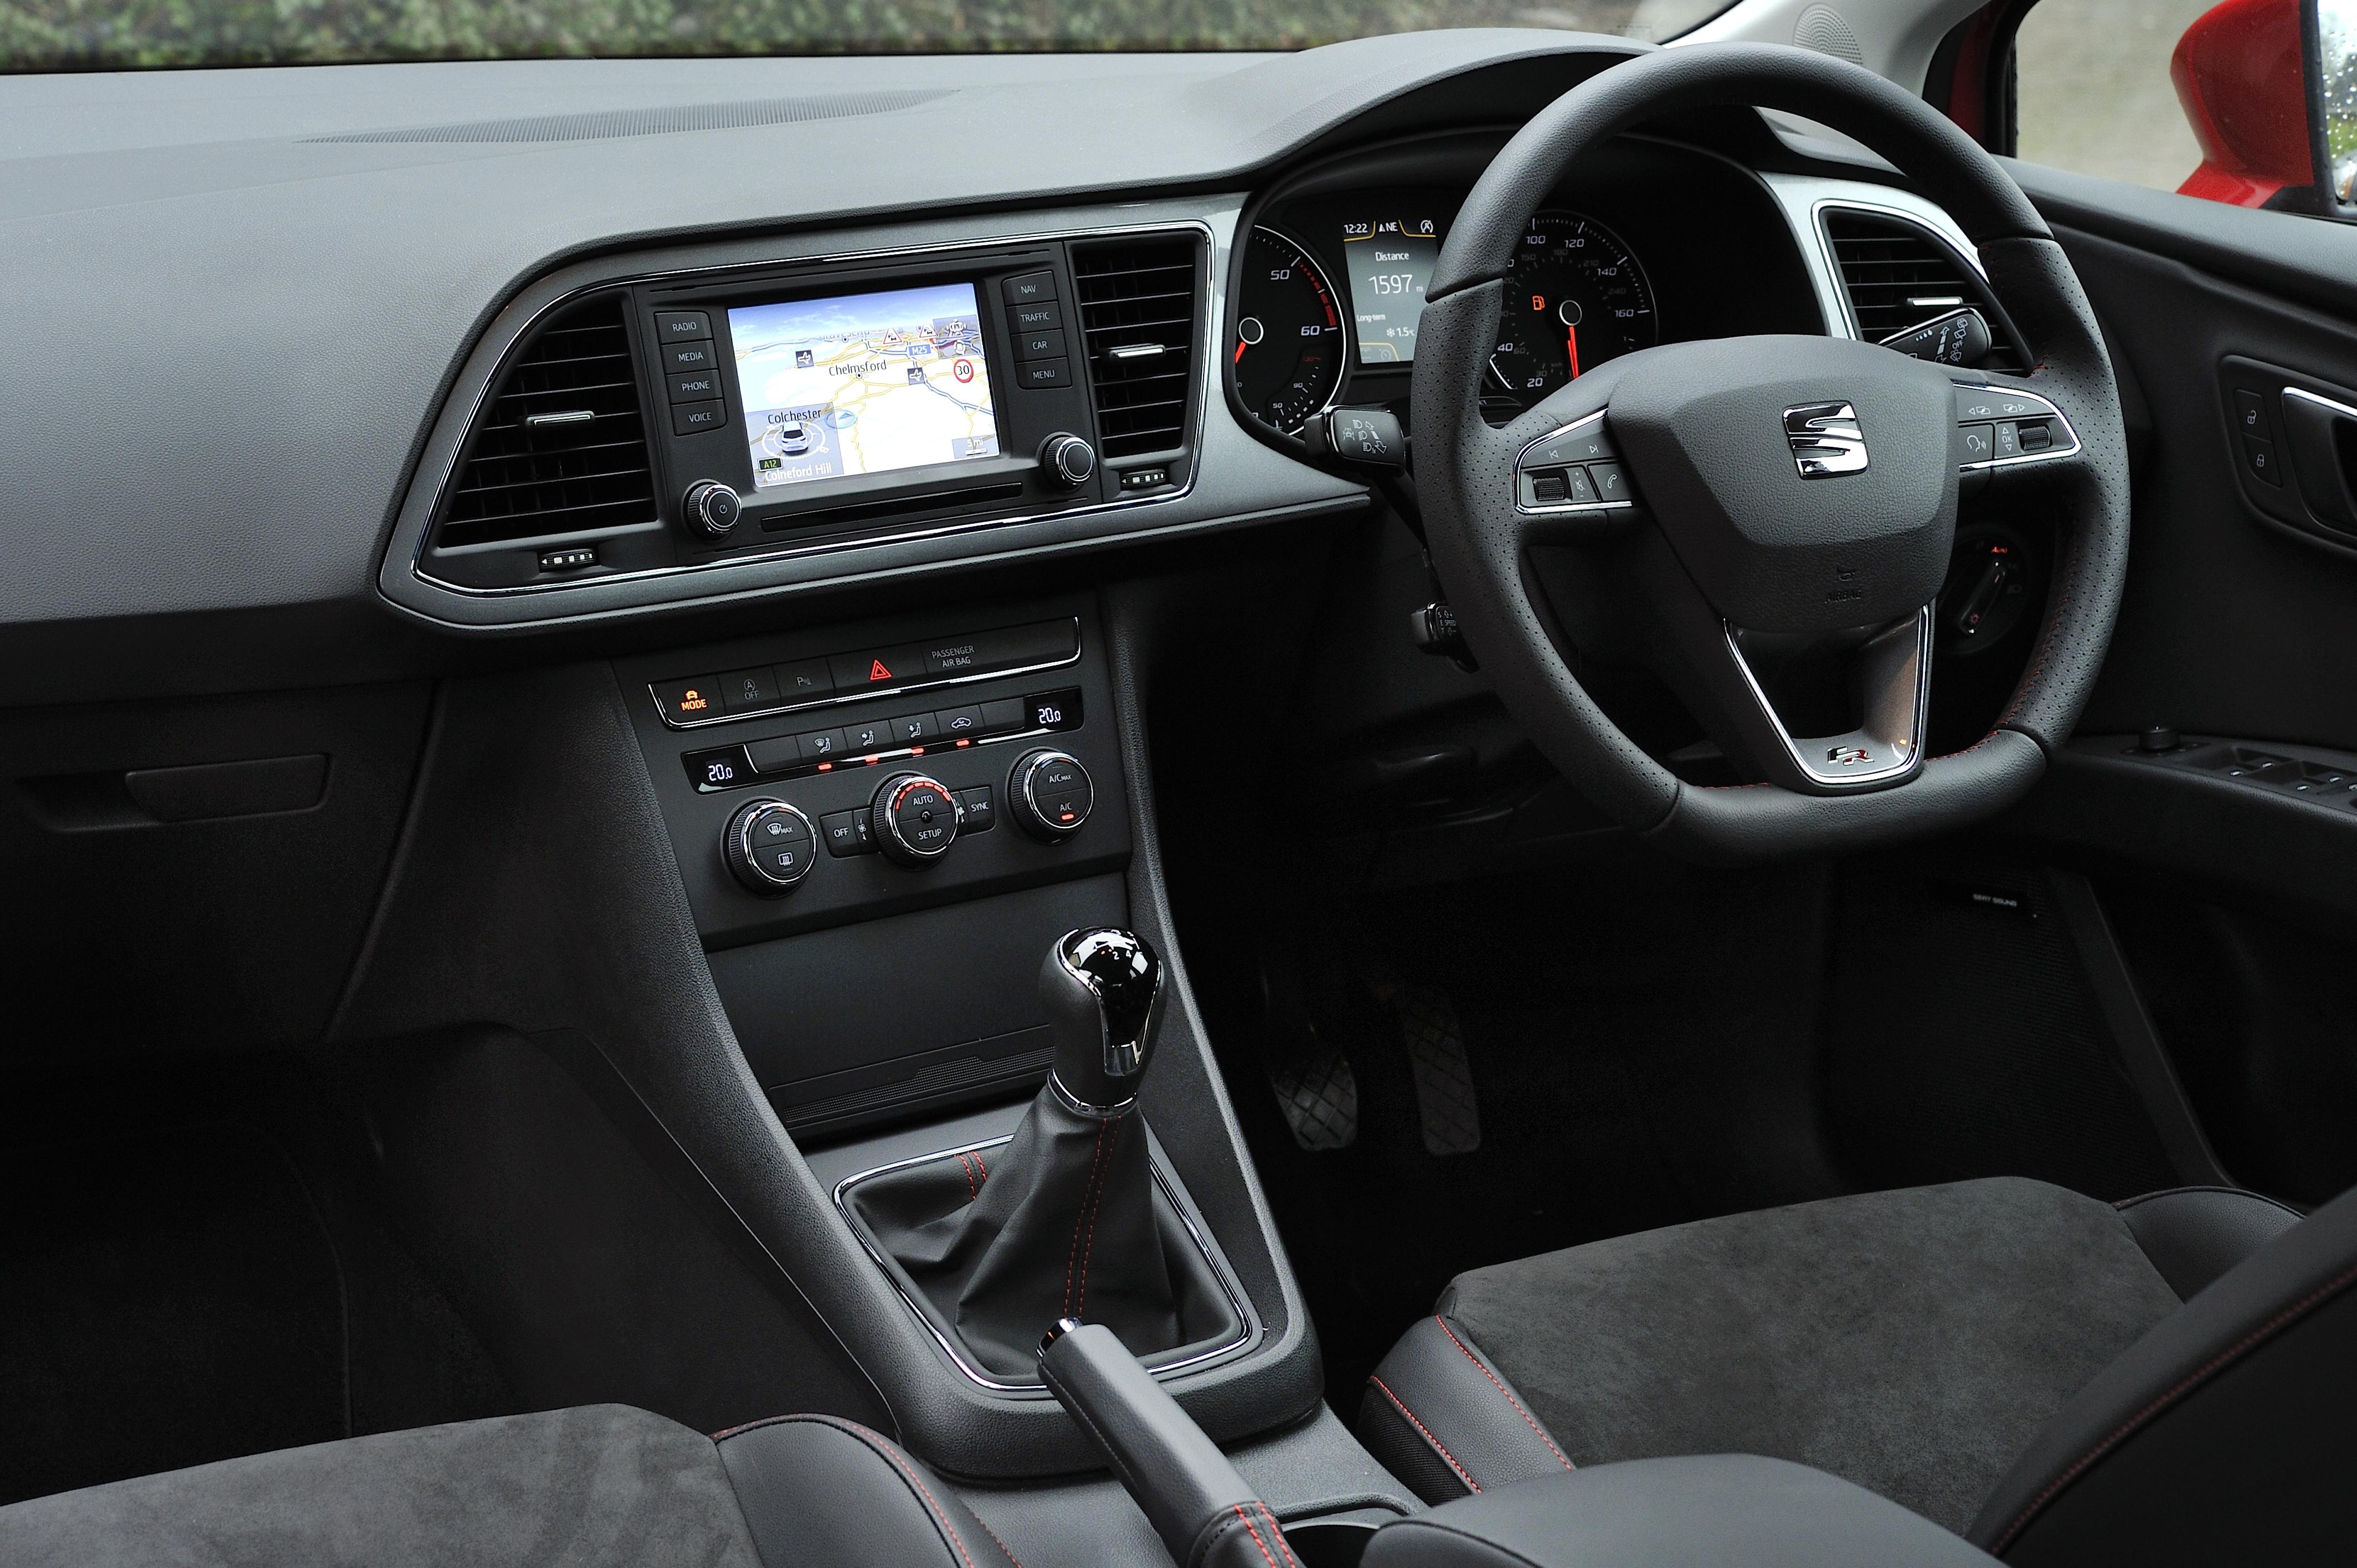 SEAT Leon FR 2.0 TDI 150 Road Test « Petroleum Vitae